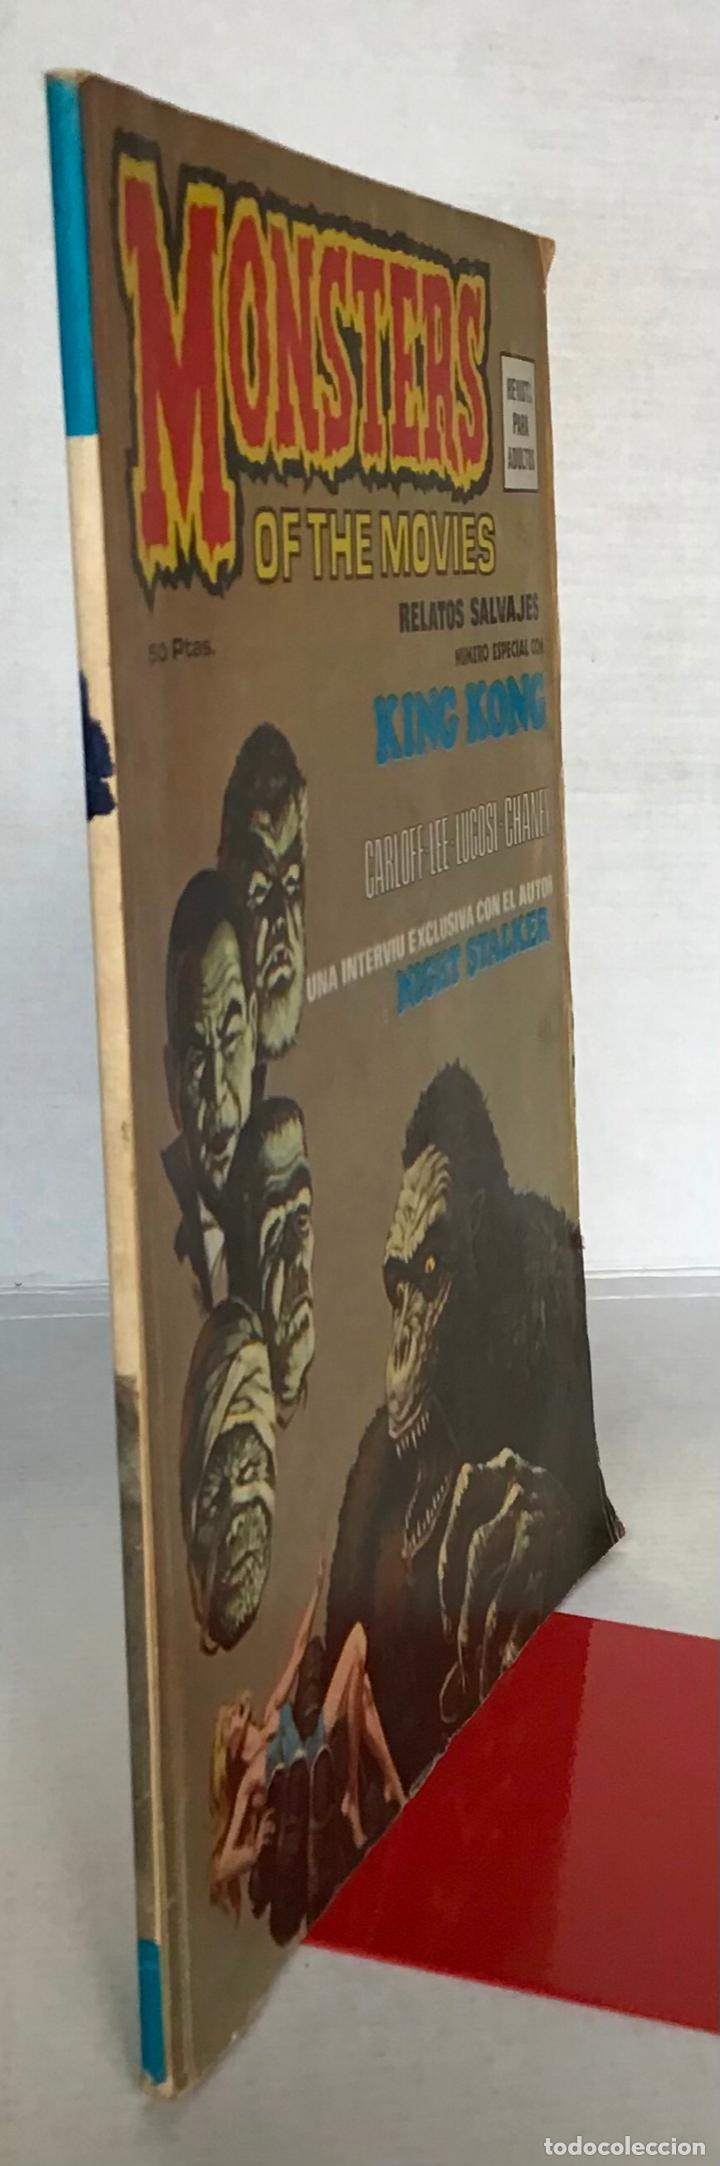 Cómics: MONSTERS OF THE MOVIES. Nº 1. RELATOS SALVAJES. NÚMERO ESPECIAL CON KING KONG. 1974. - Foto 2 - 24630331